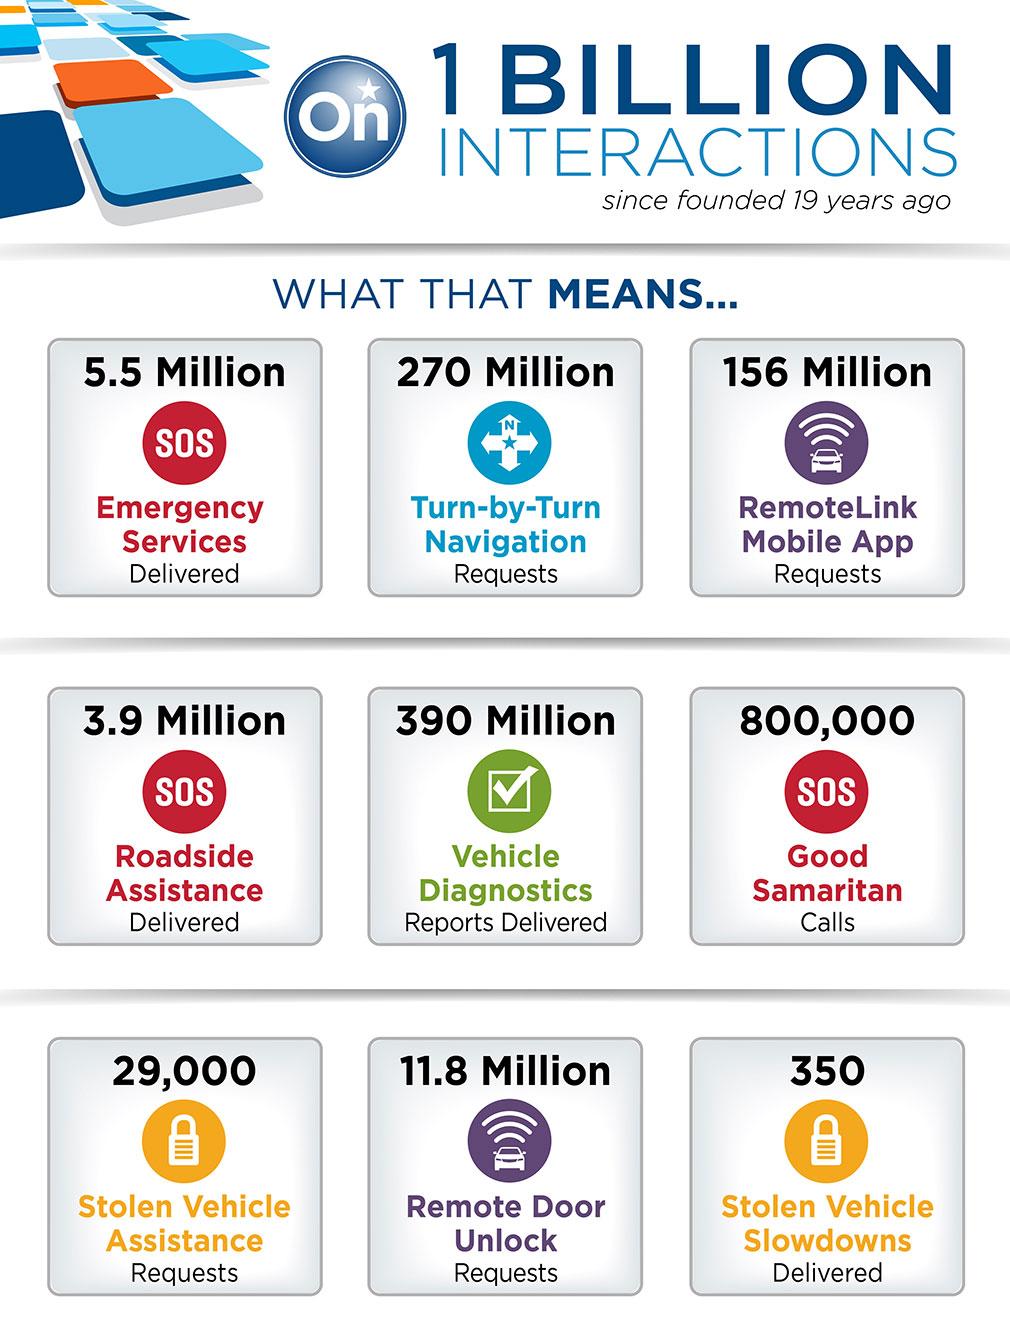 OnStar-1Billion-Interactions-Infographic